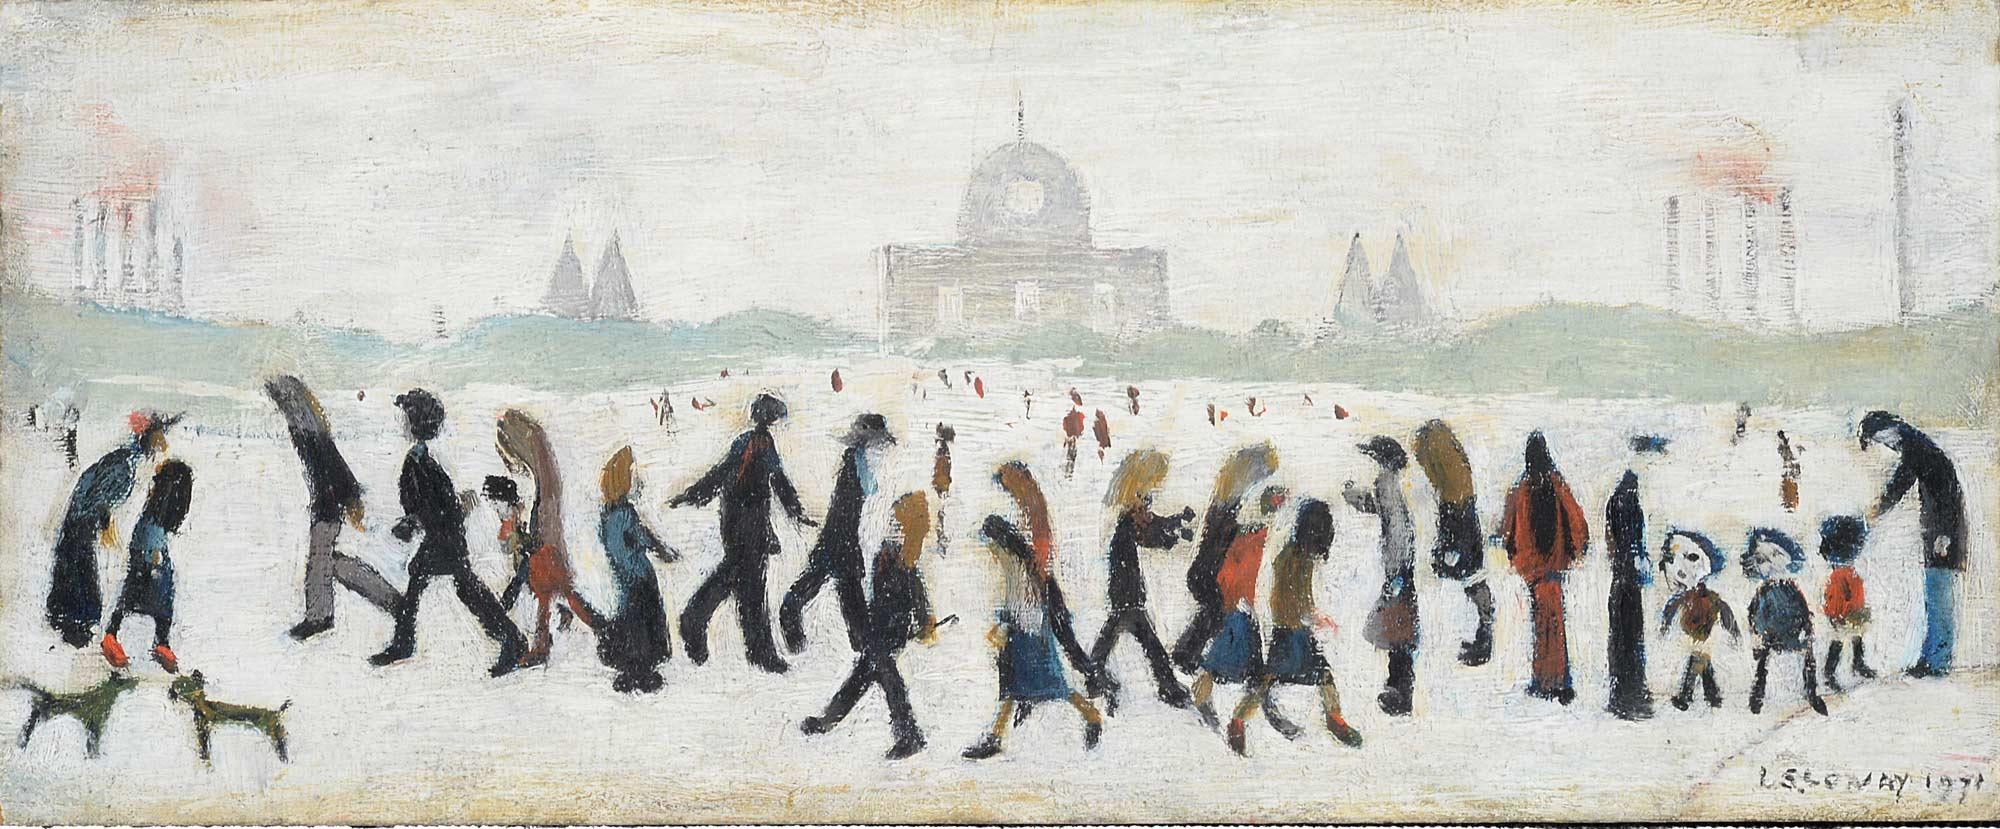 L.S. Lowry 'People in a Park' – Estimate: £60,000-90,000